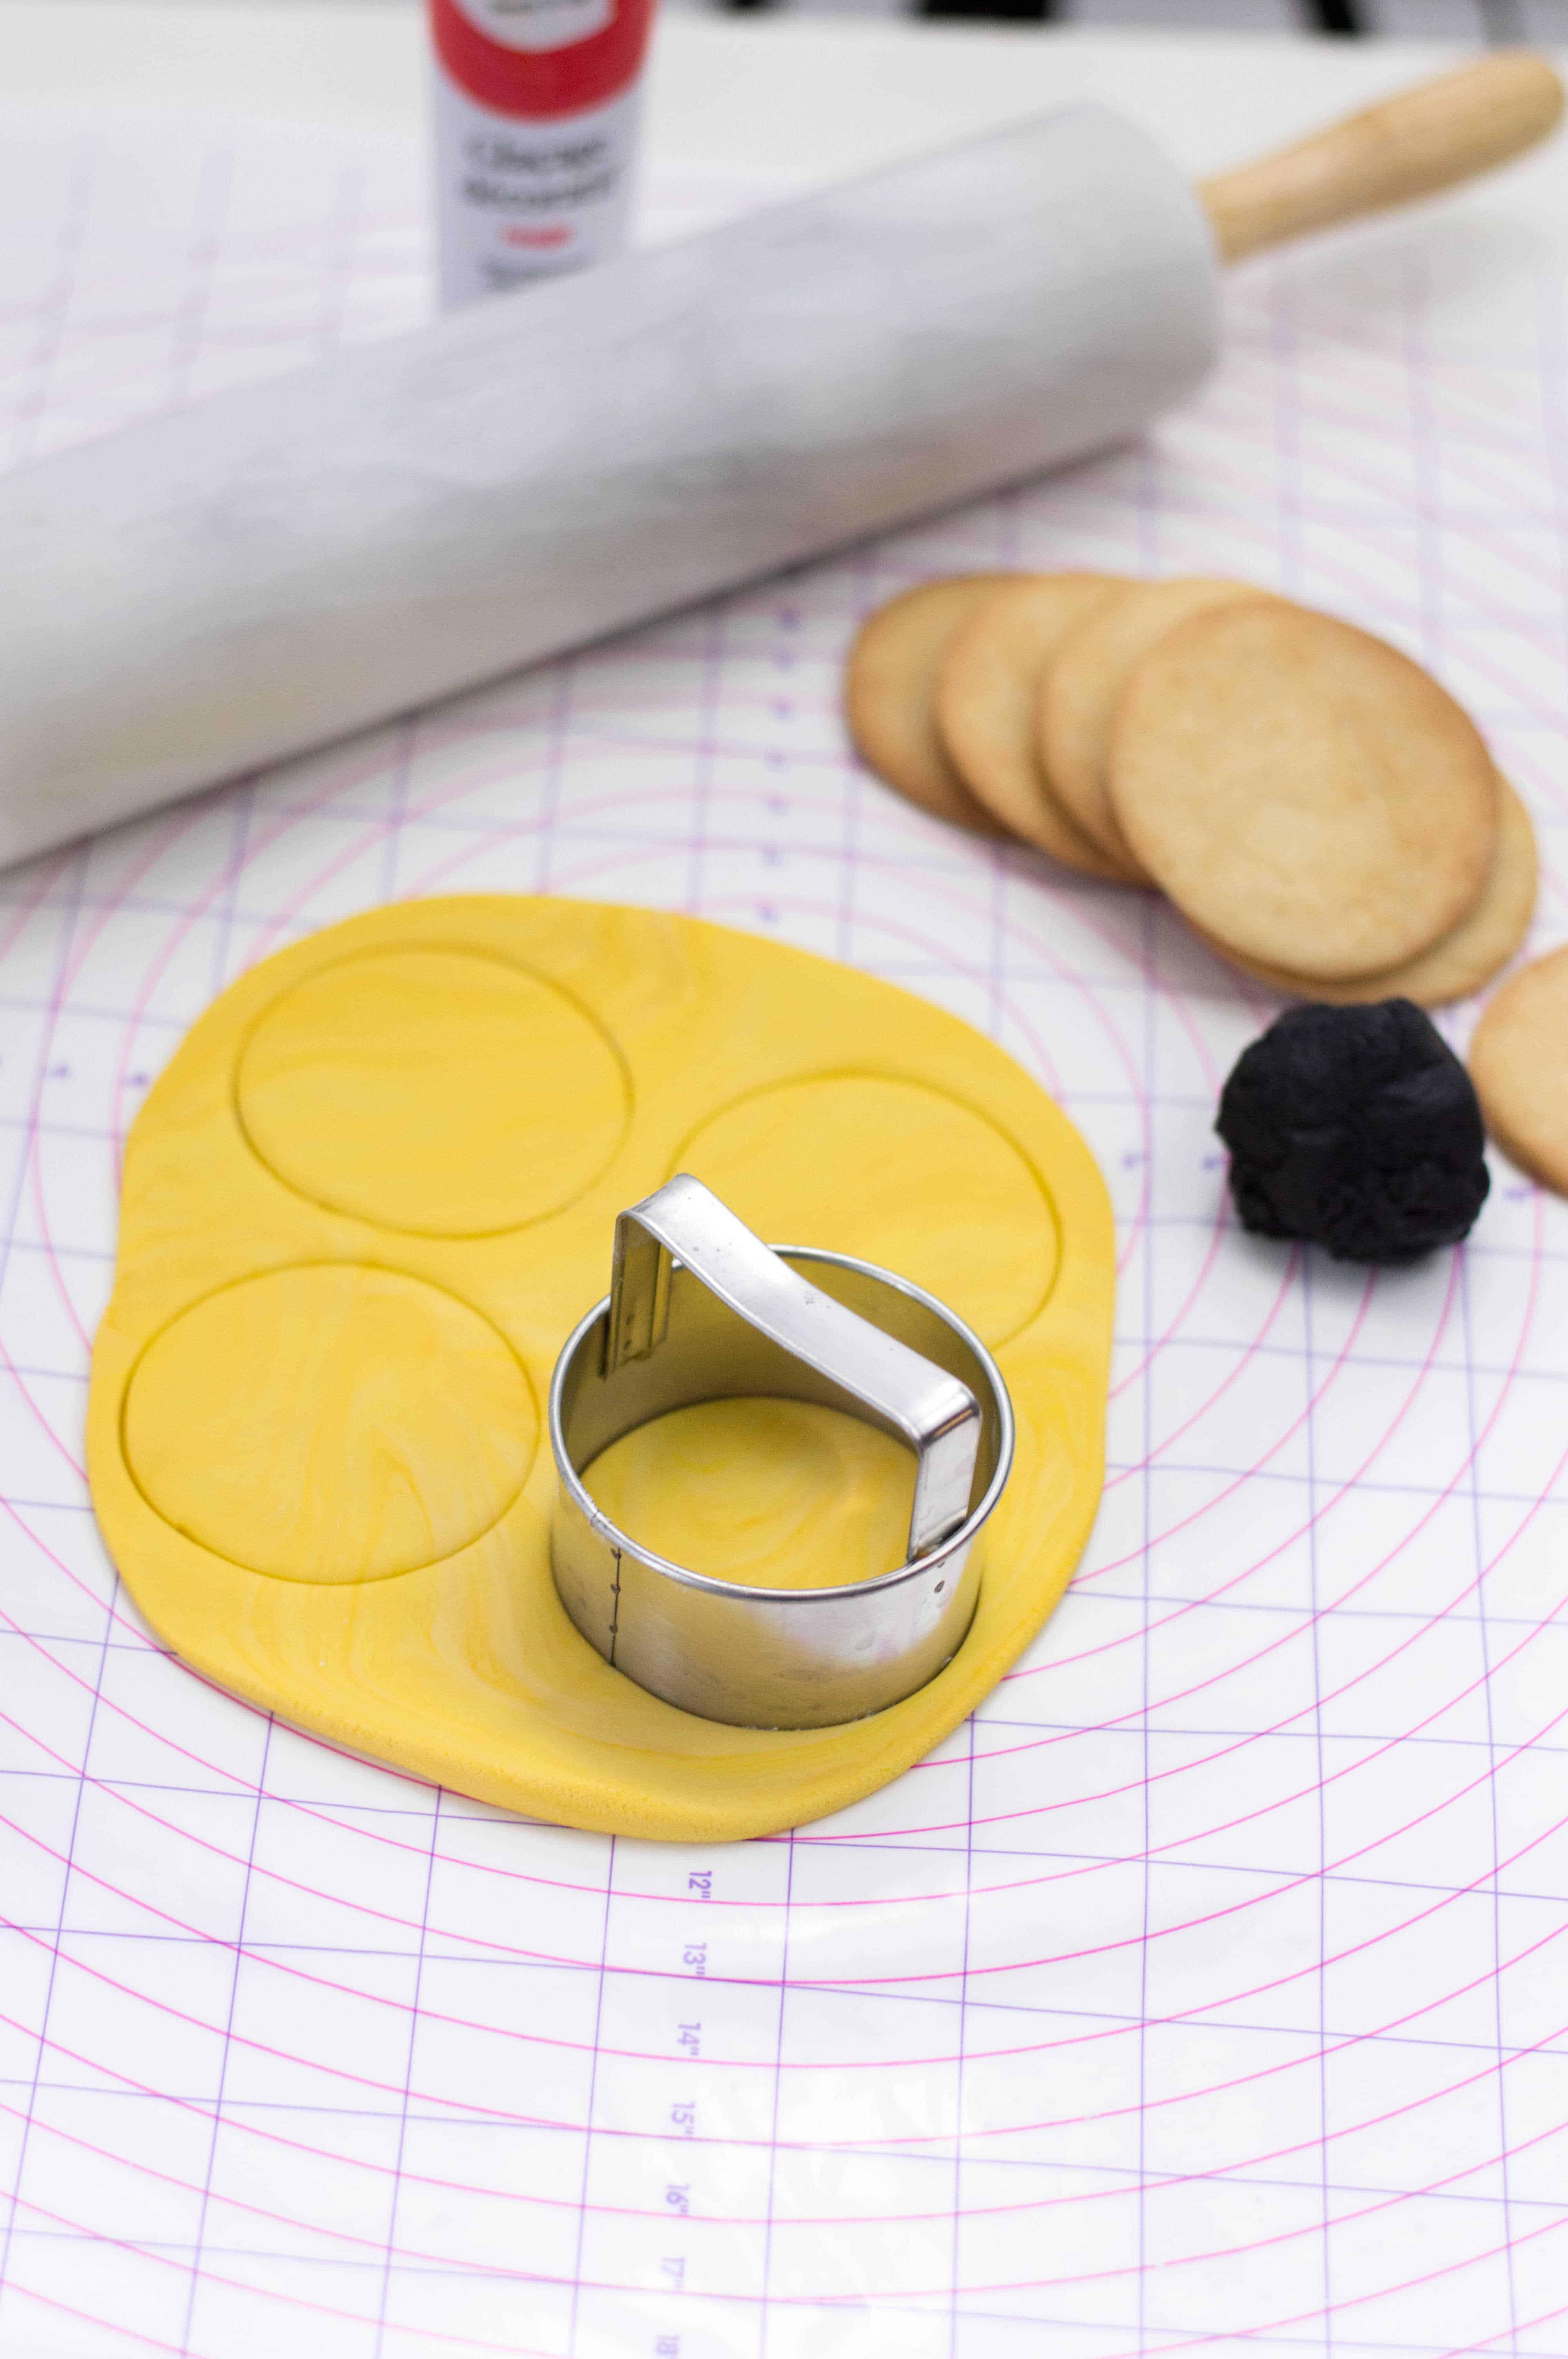 cutting the dough into circles